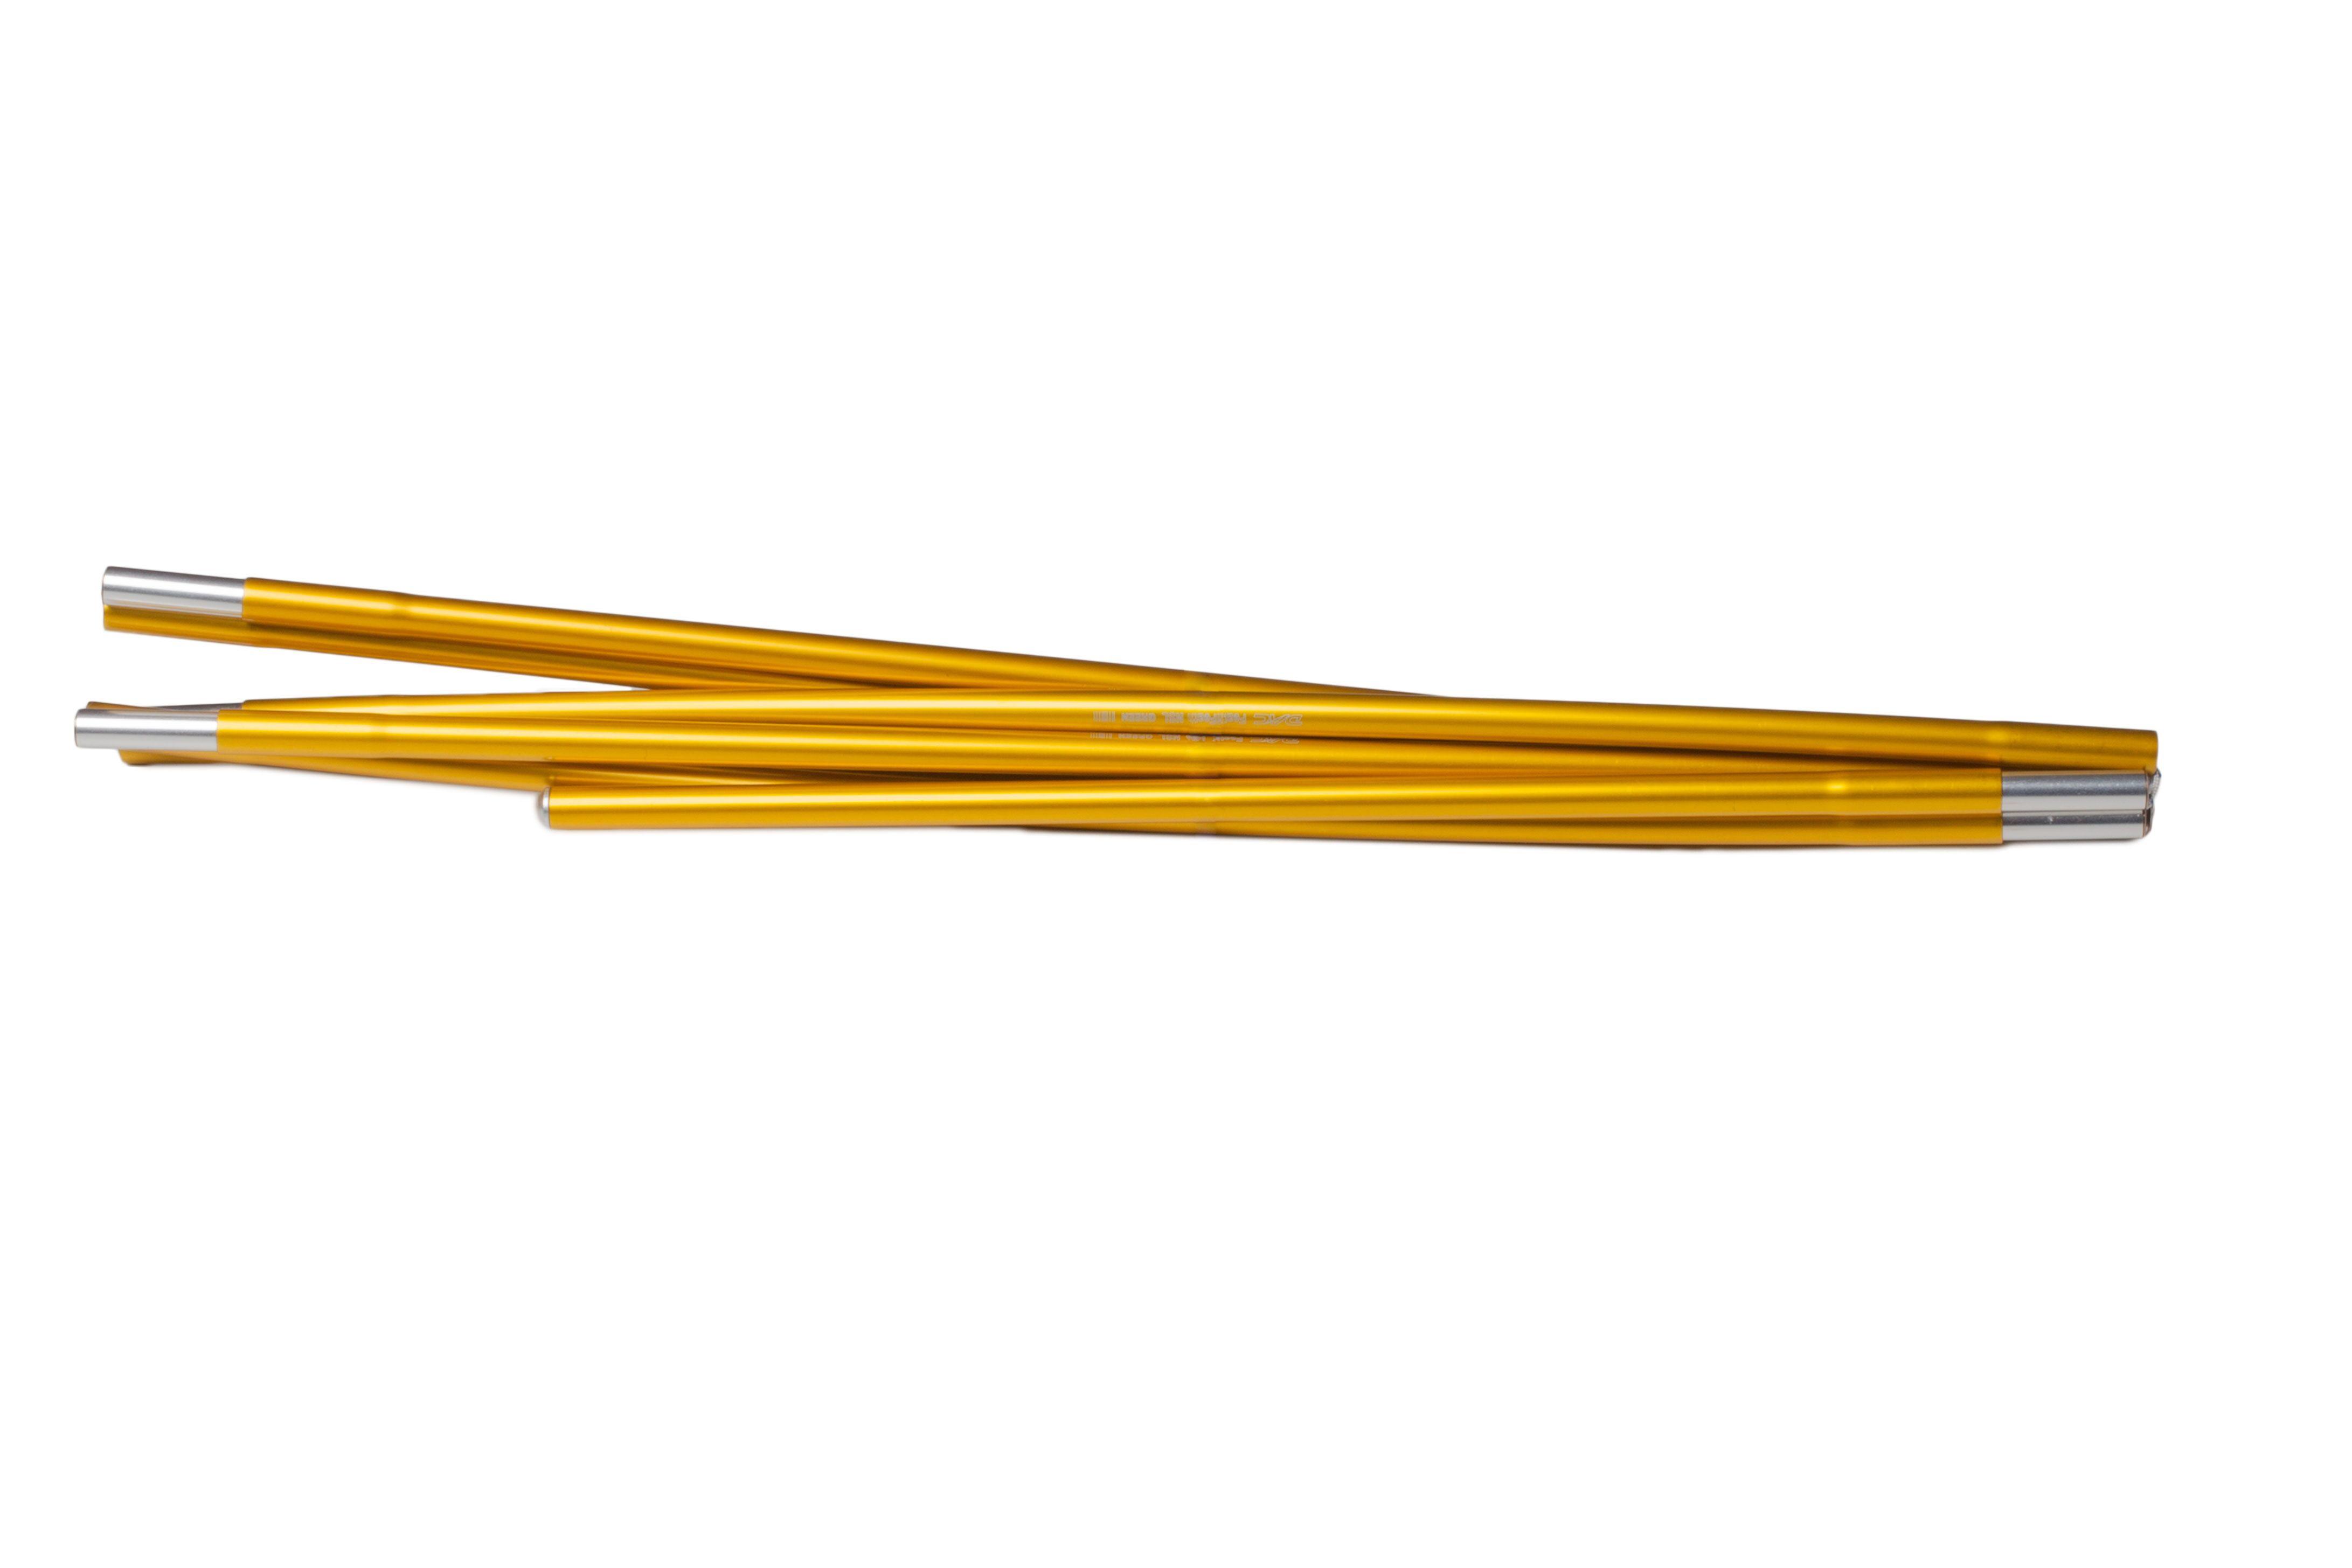 Arceau 368 cm x 9mm Nallo 4 / 4 GT, Jannu